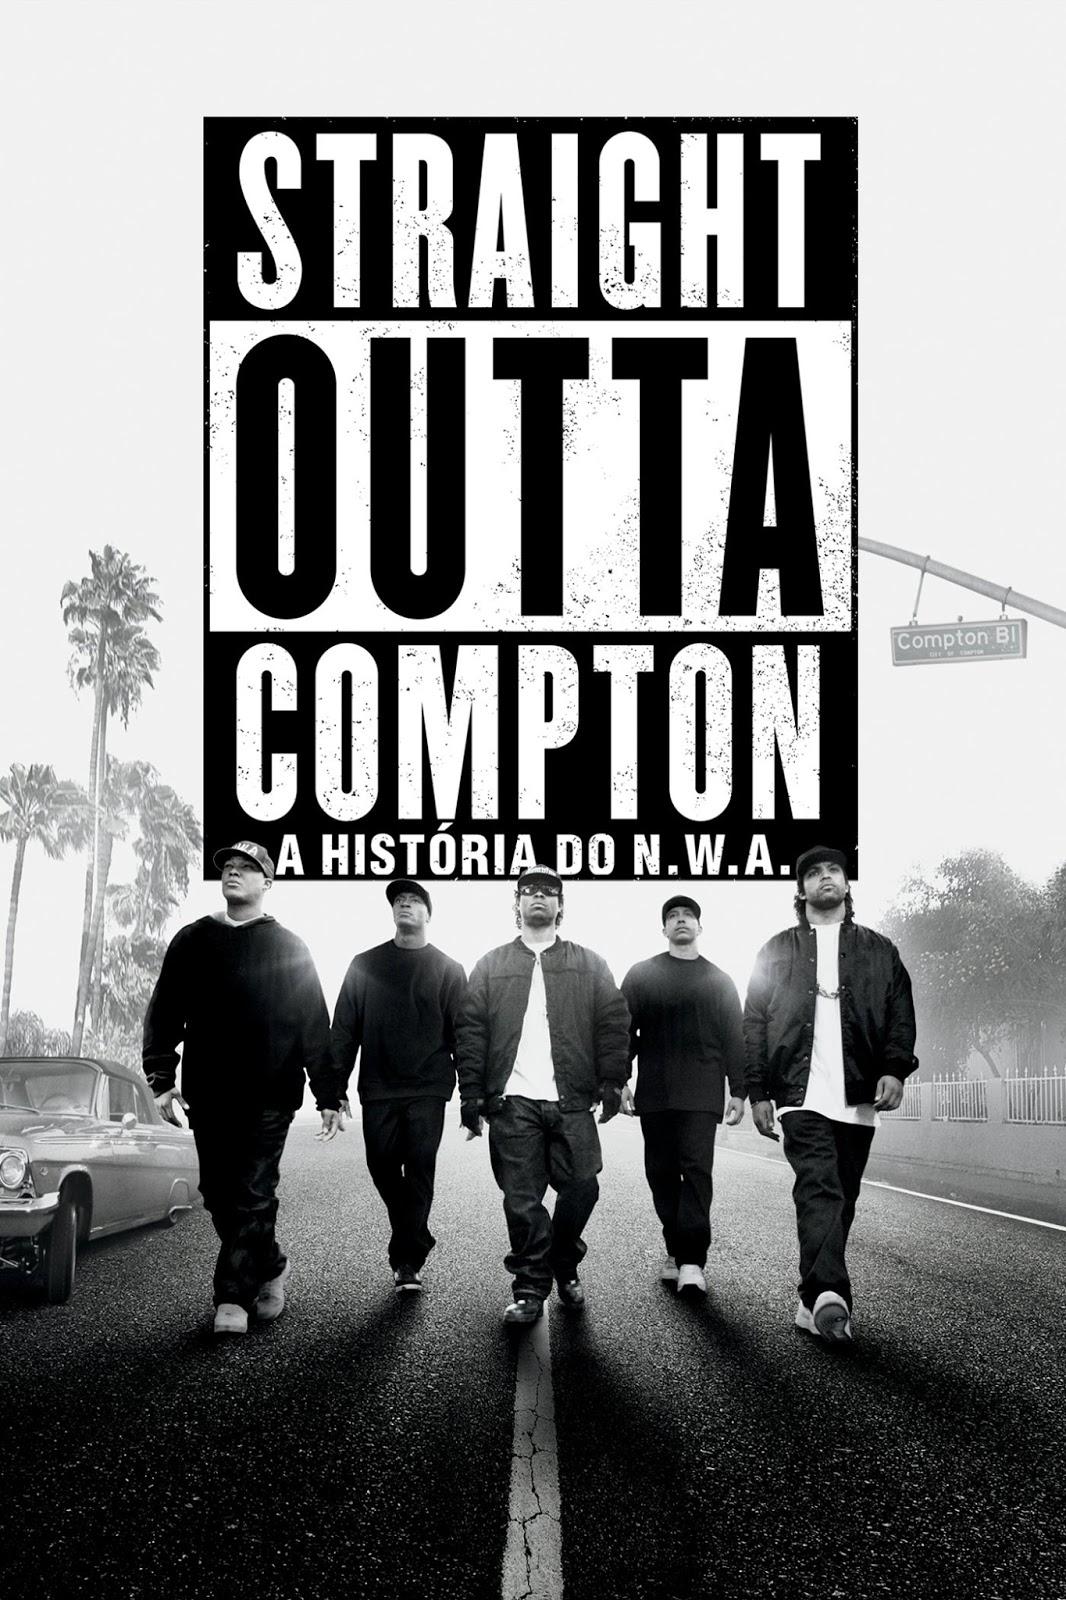 Straight Outta Compton: A História do N.W.A. – Dublado (2015)